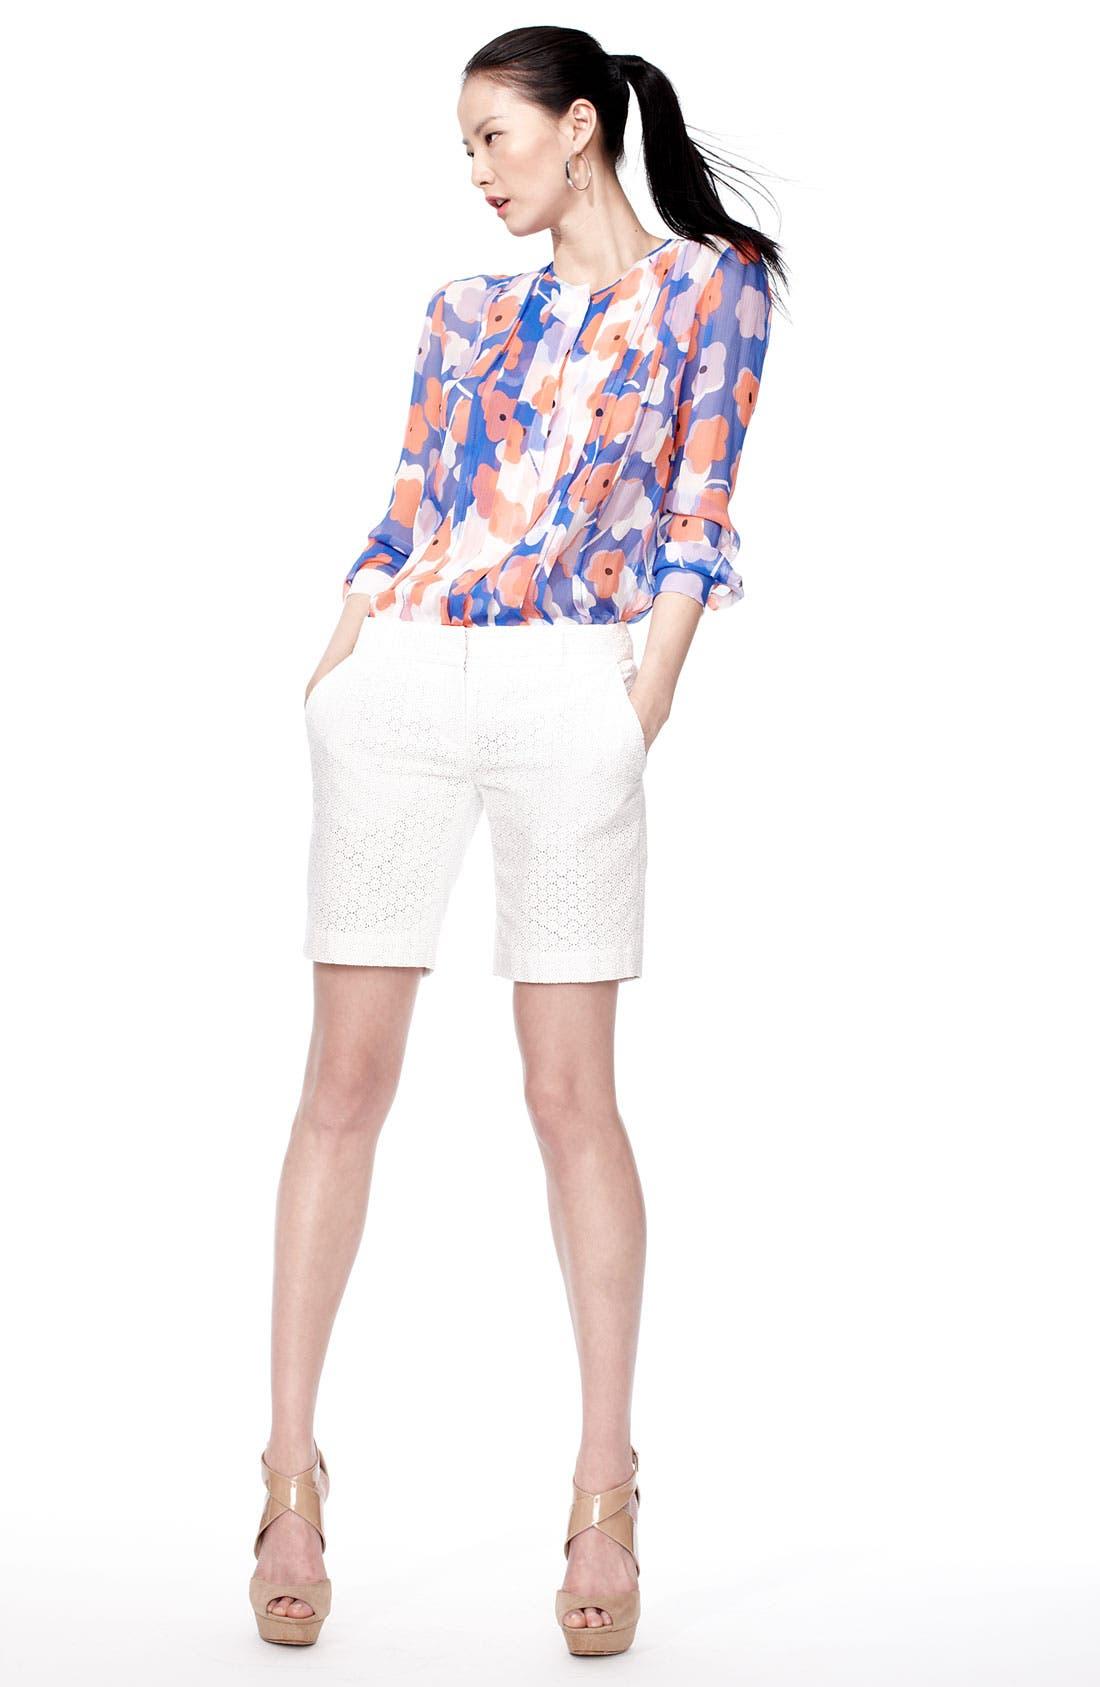 Main Image - Diane von Furstenberg Blouse & Shorts